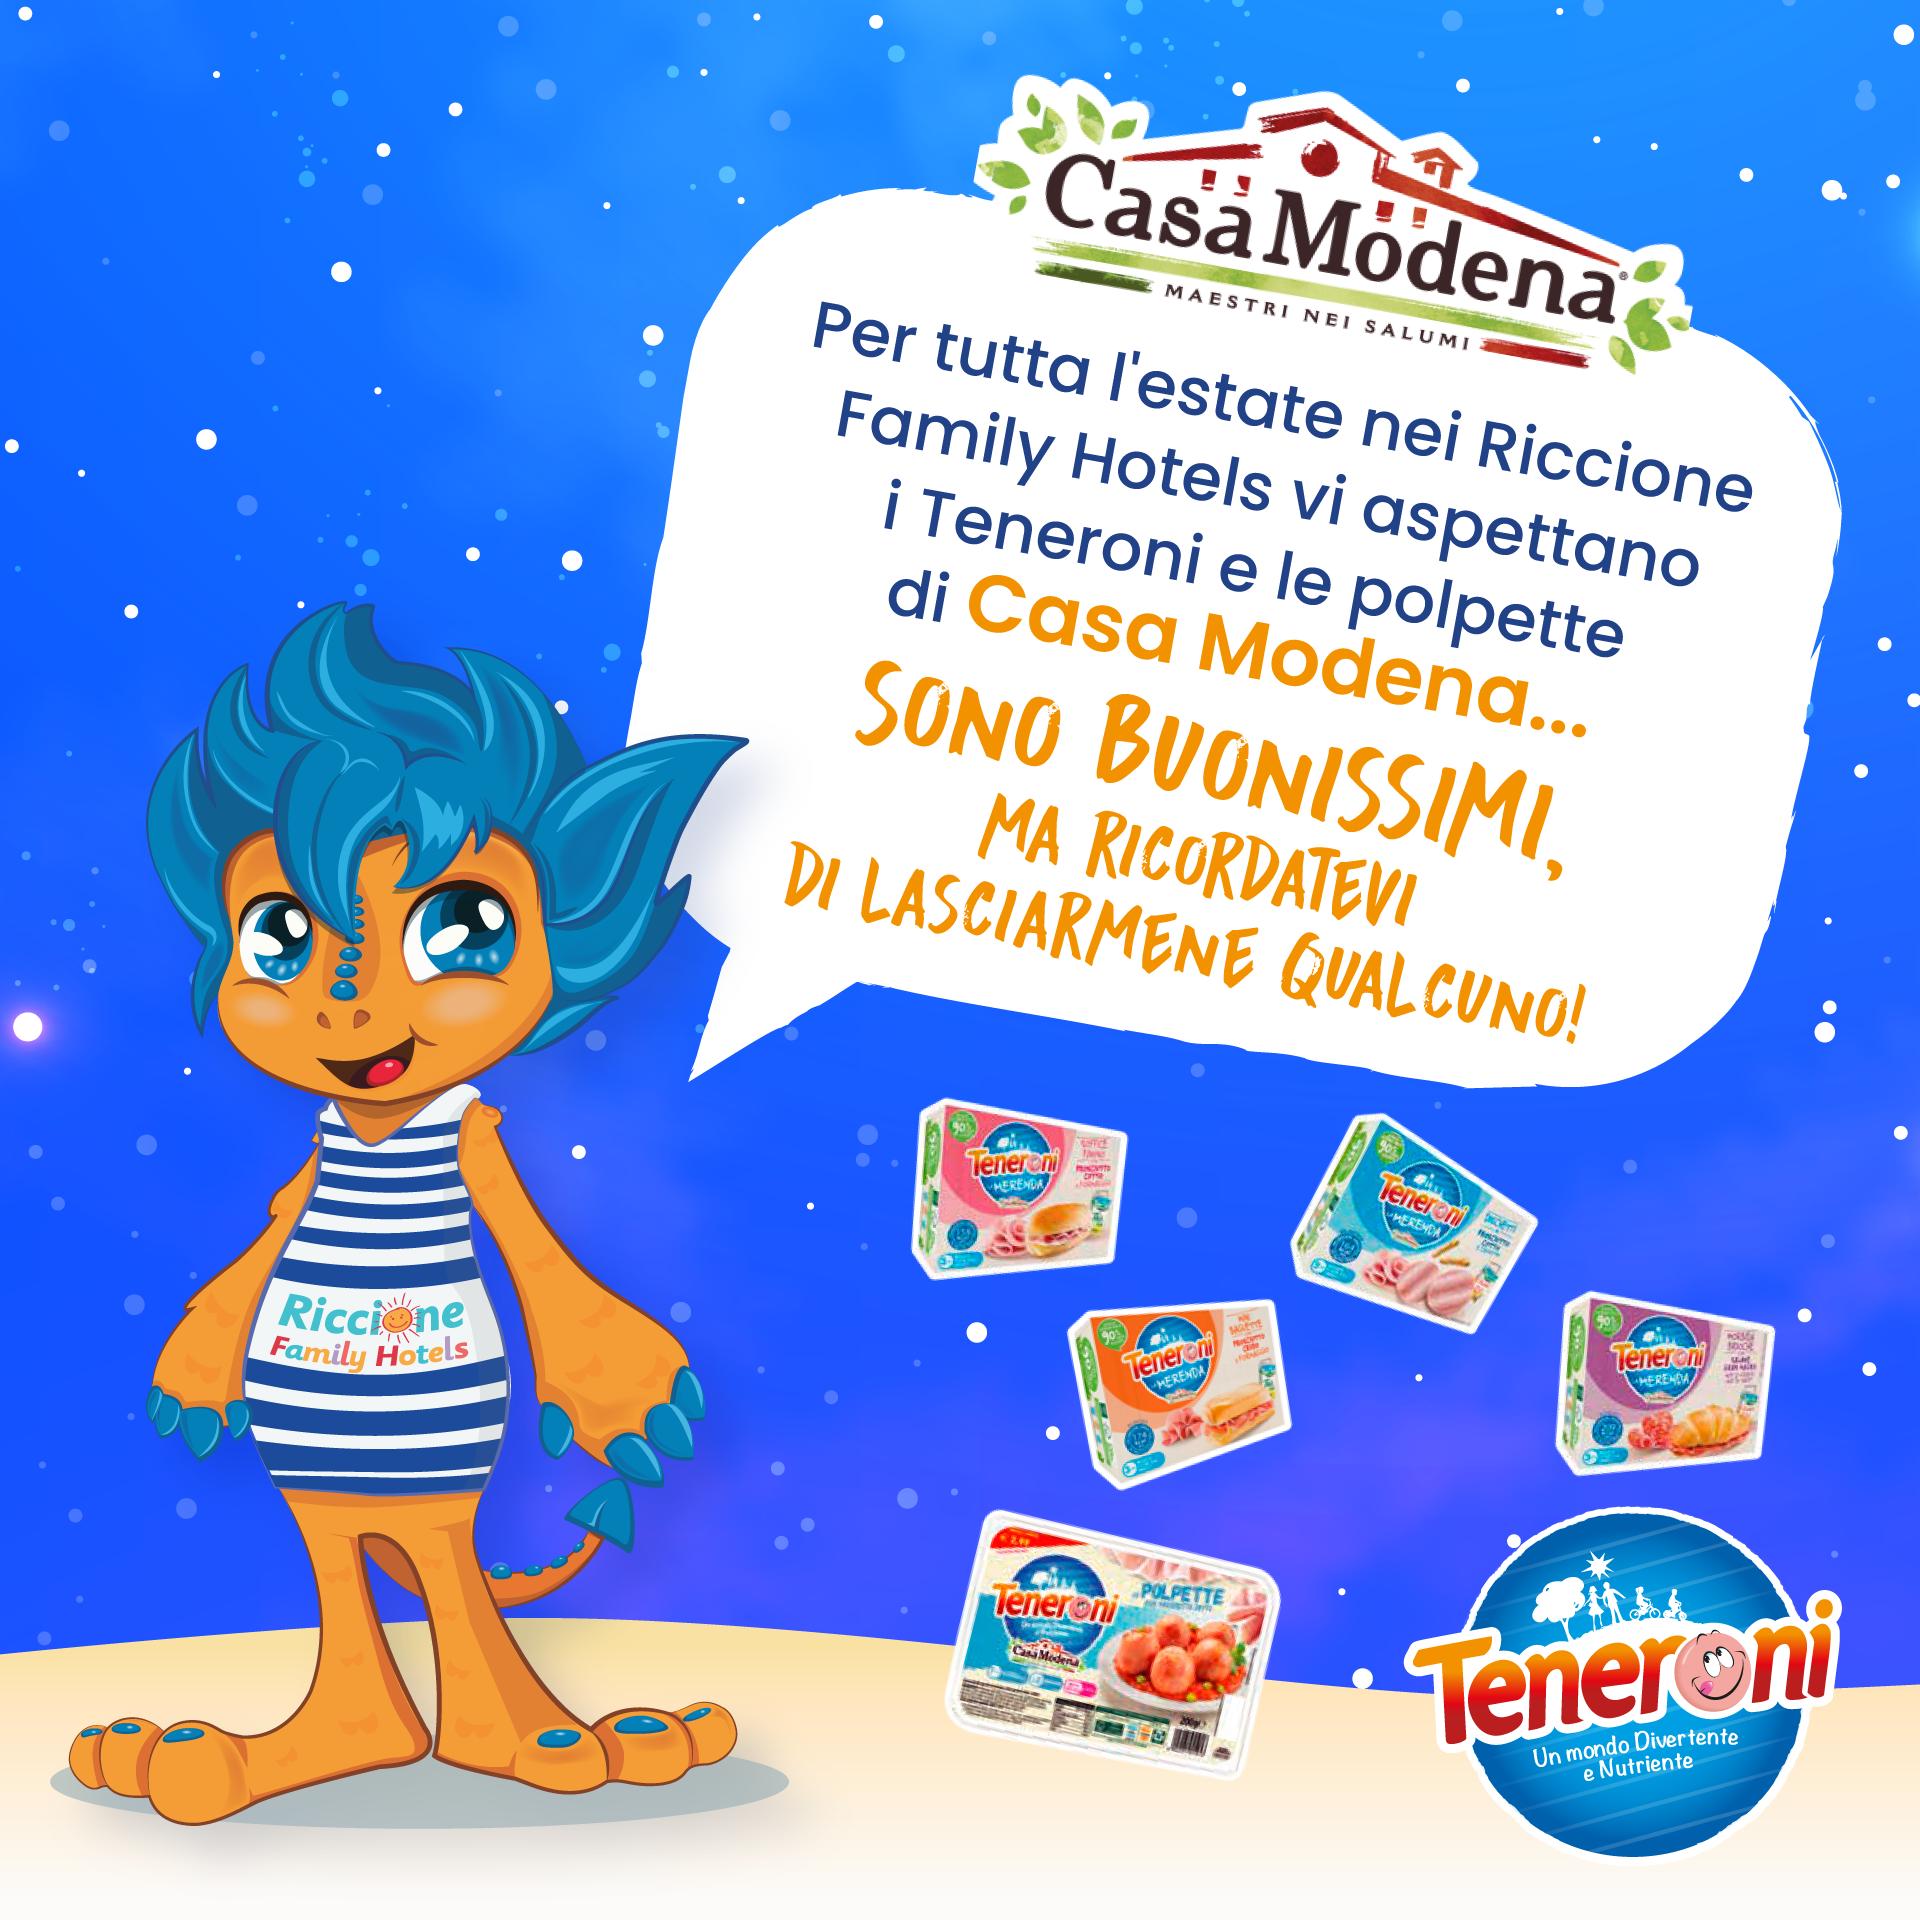 Casa Modena Days